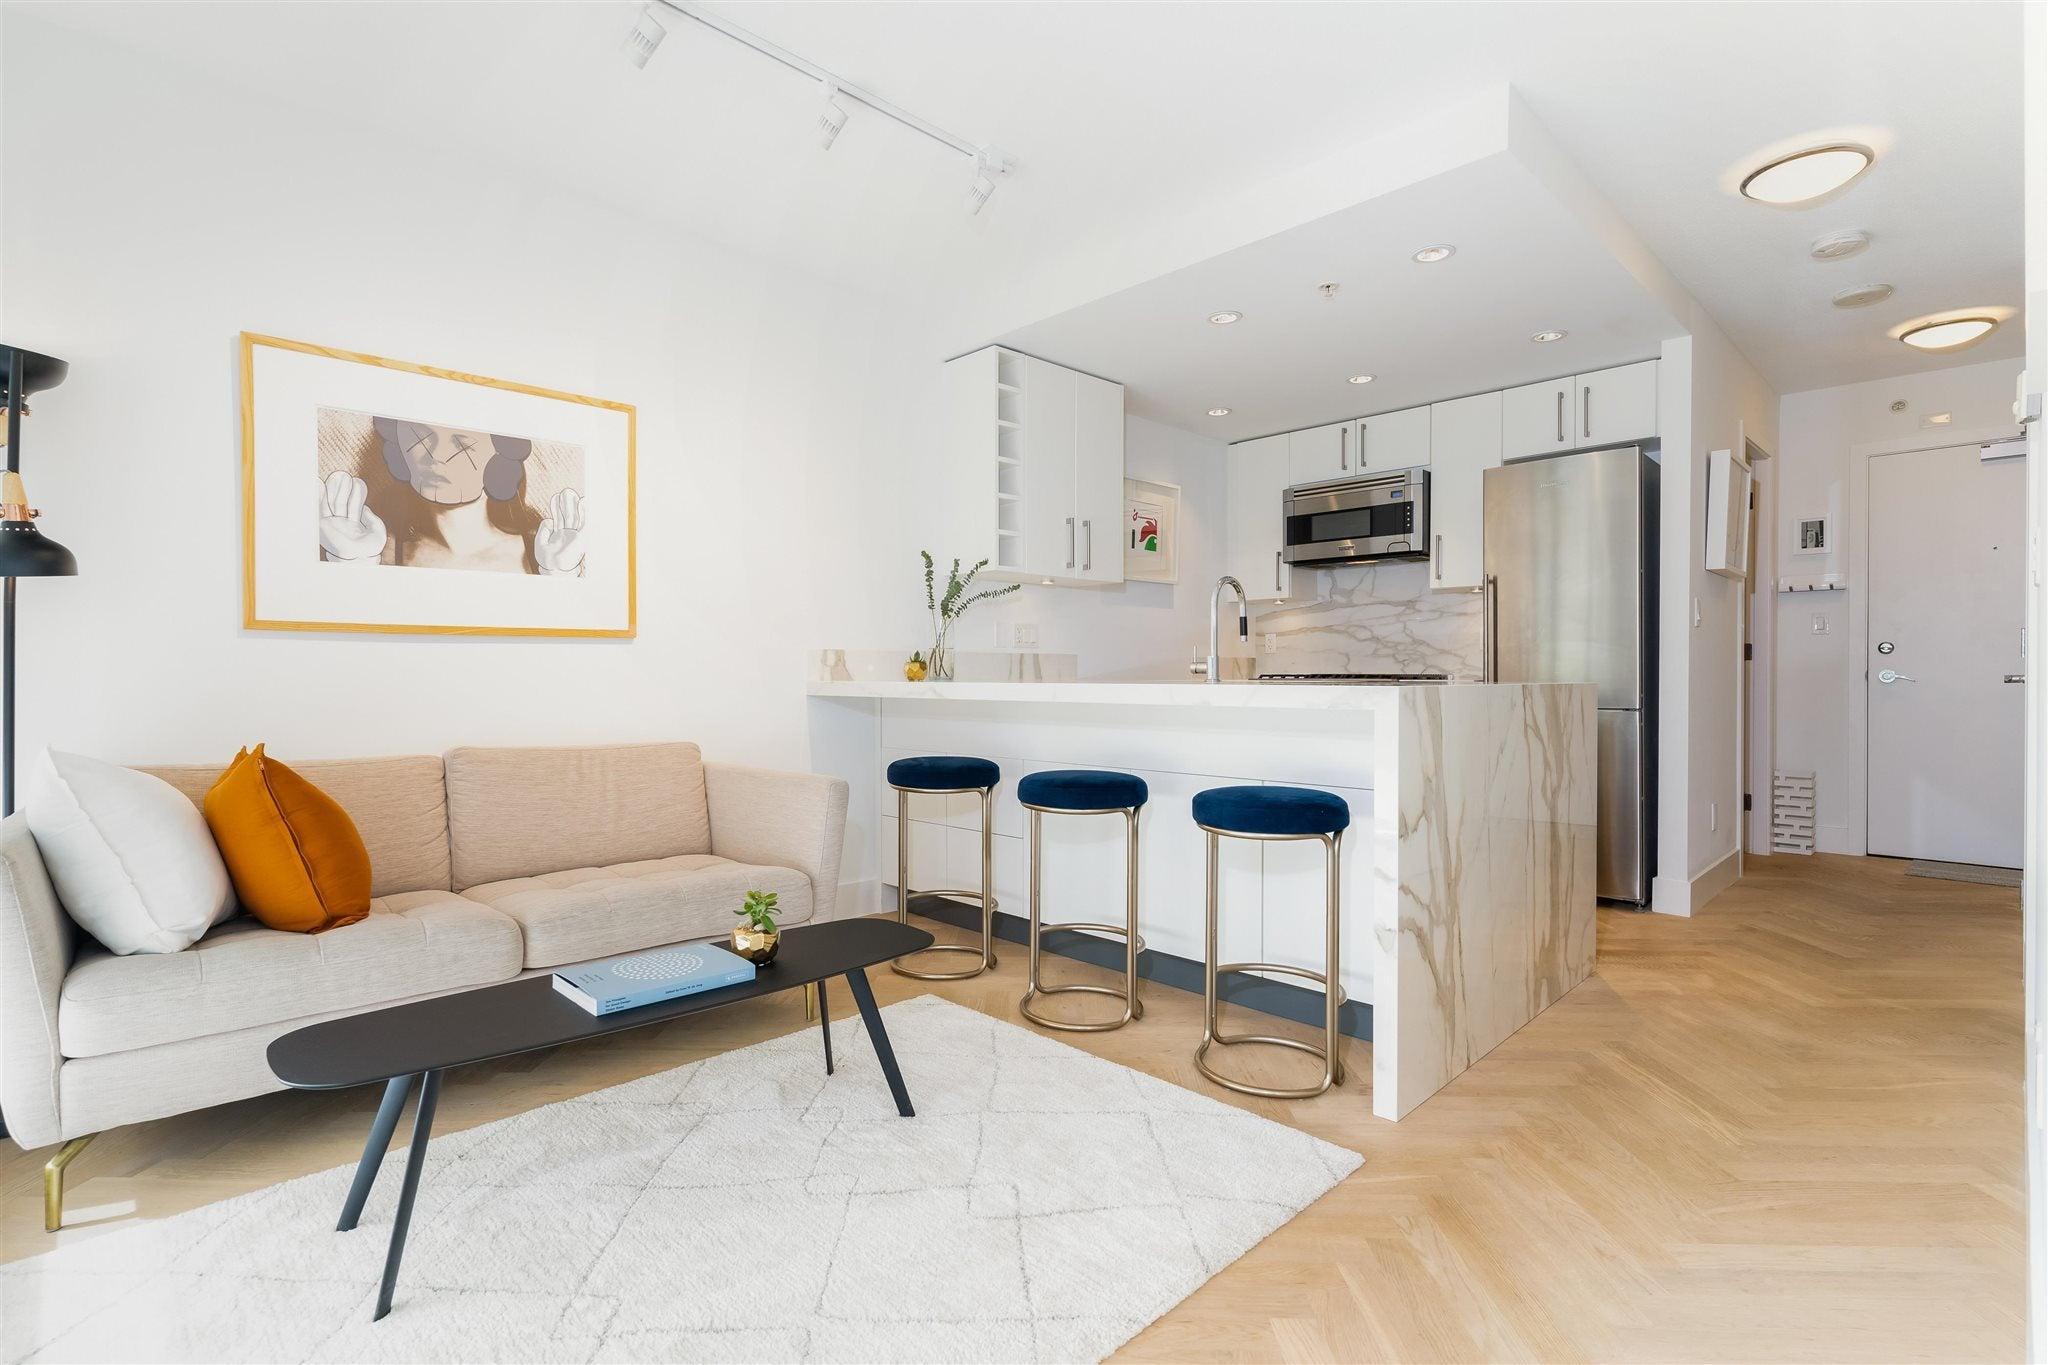 501 1708 COLUMBIA STREET - False Creek Apartment/Condo for sale, 1 Bedroom (R2603692) - #1